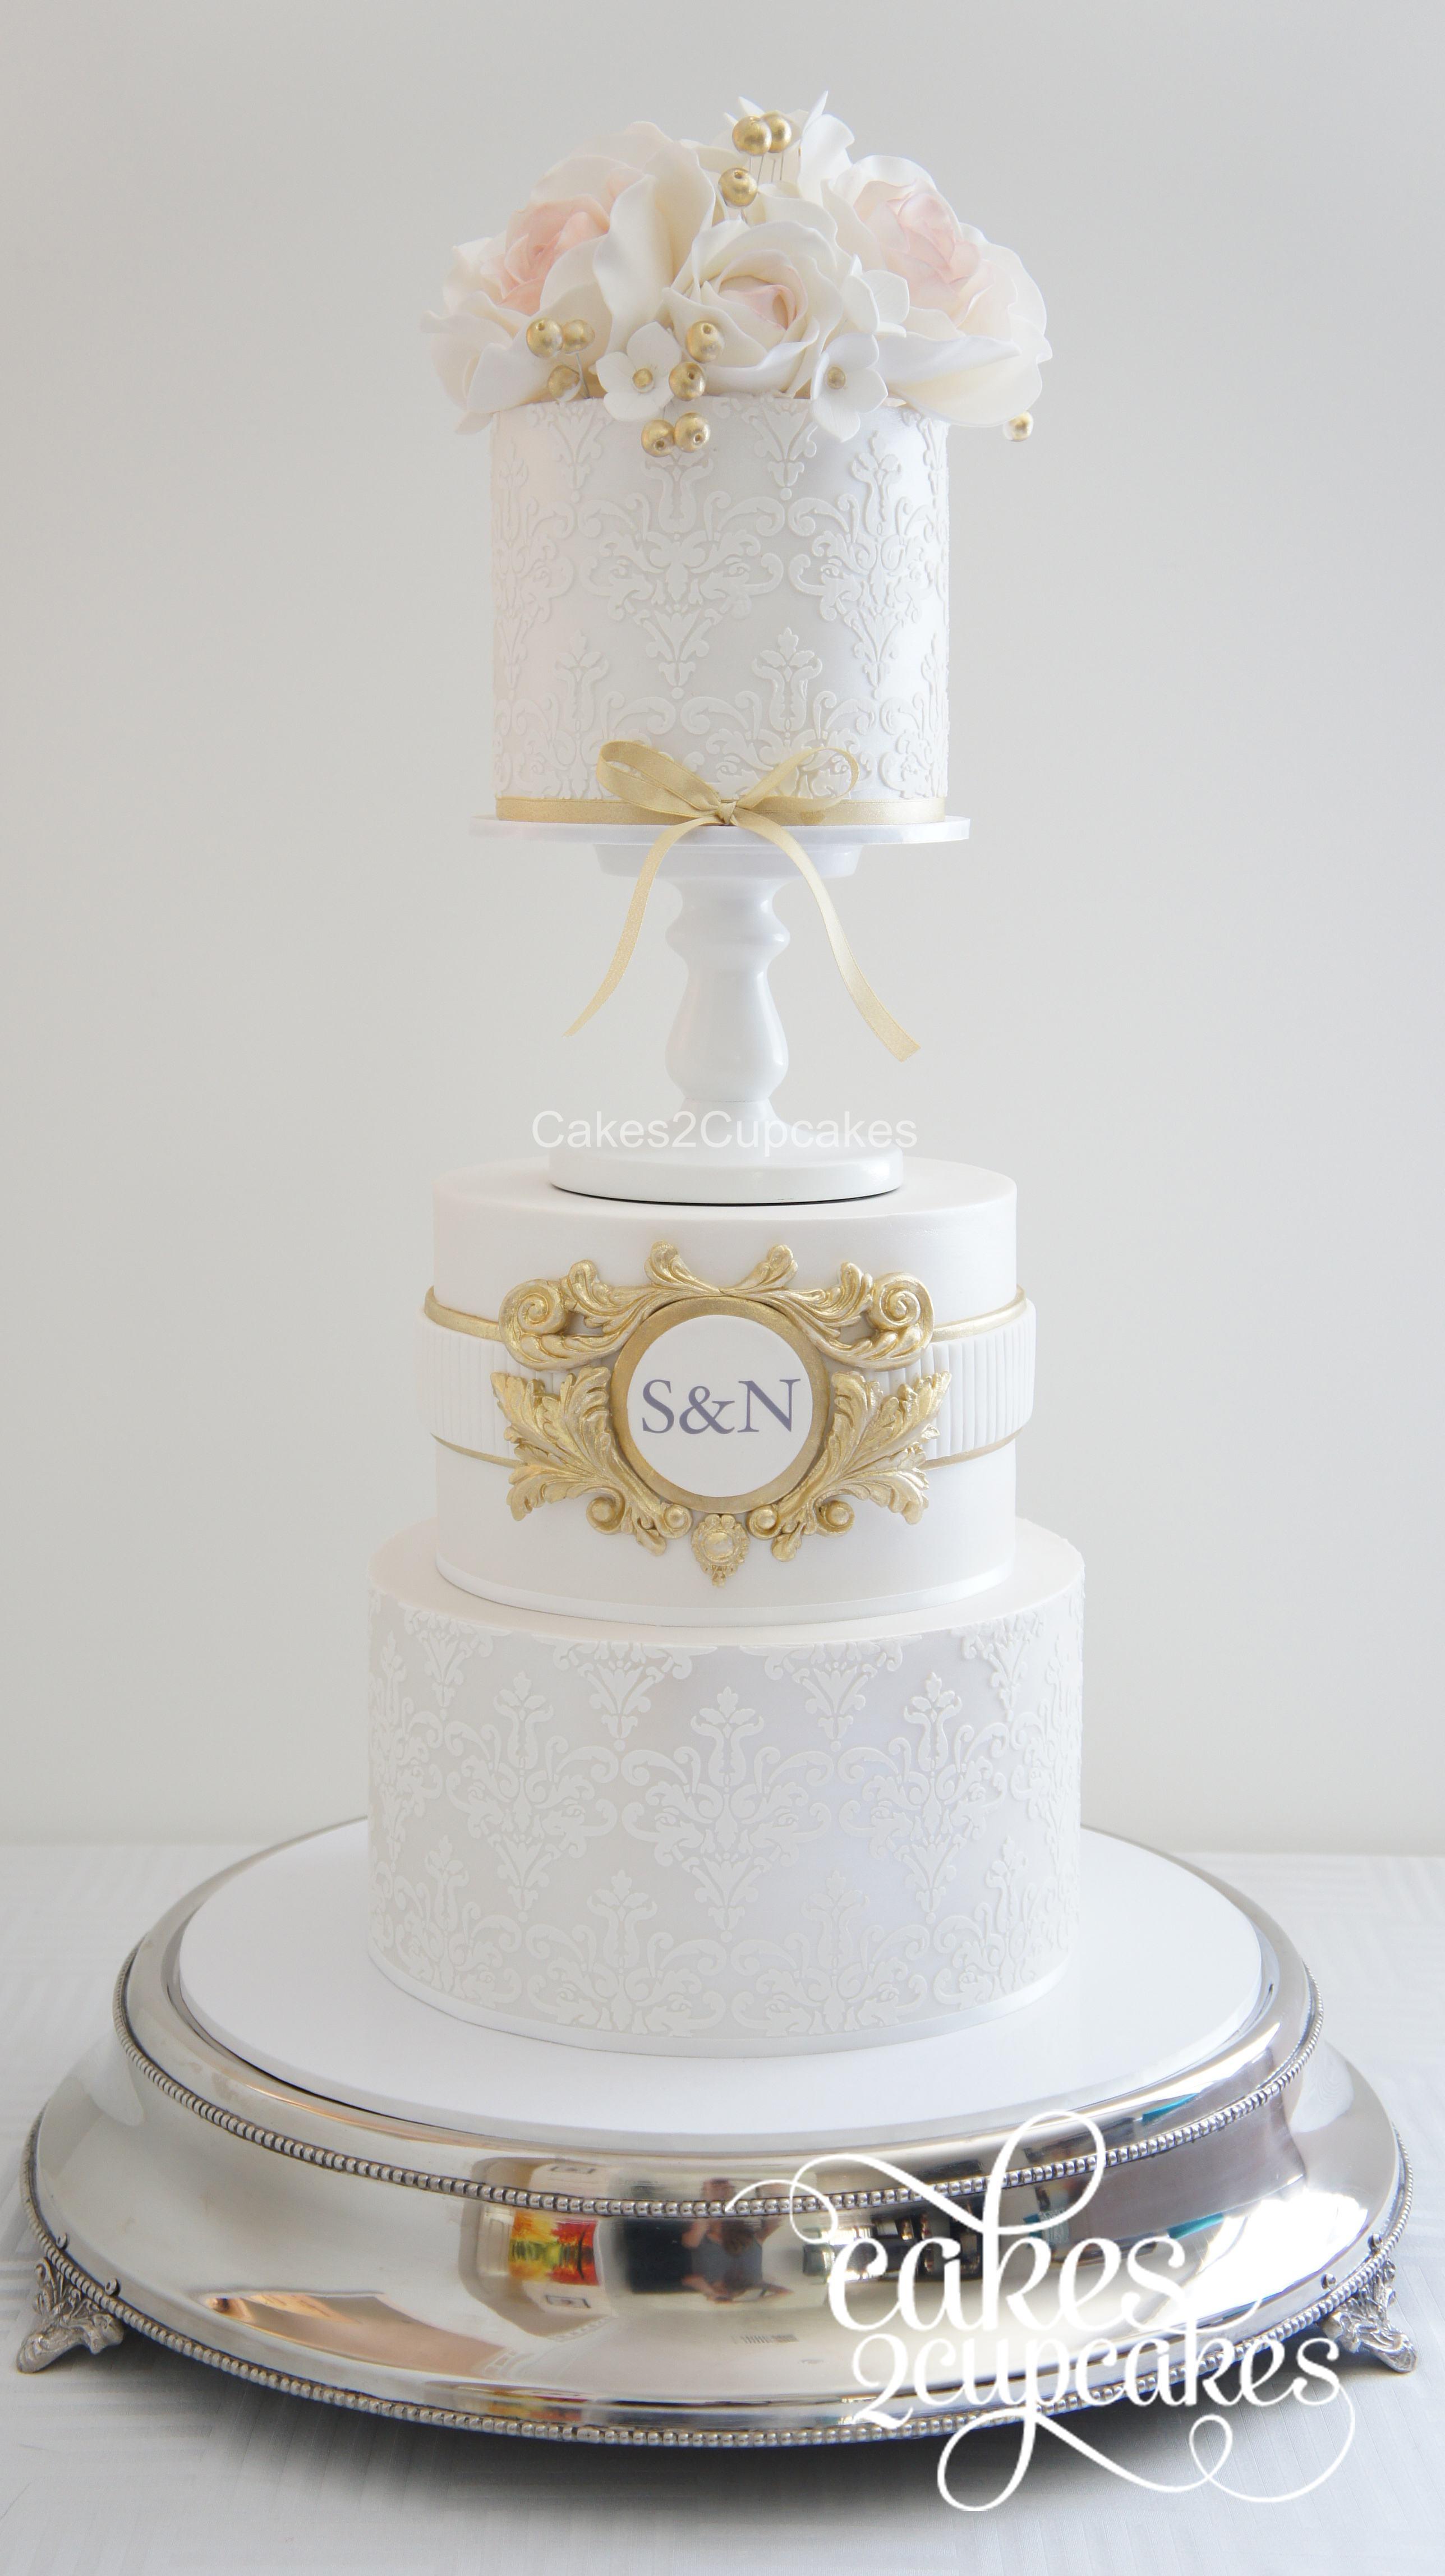 cakes2cupcakes-gold-monogram.jpg